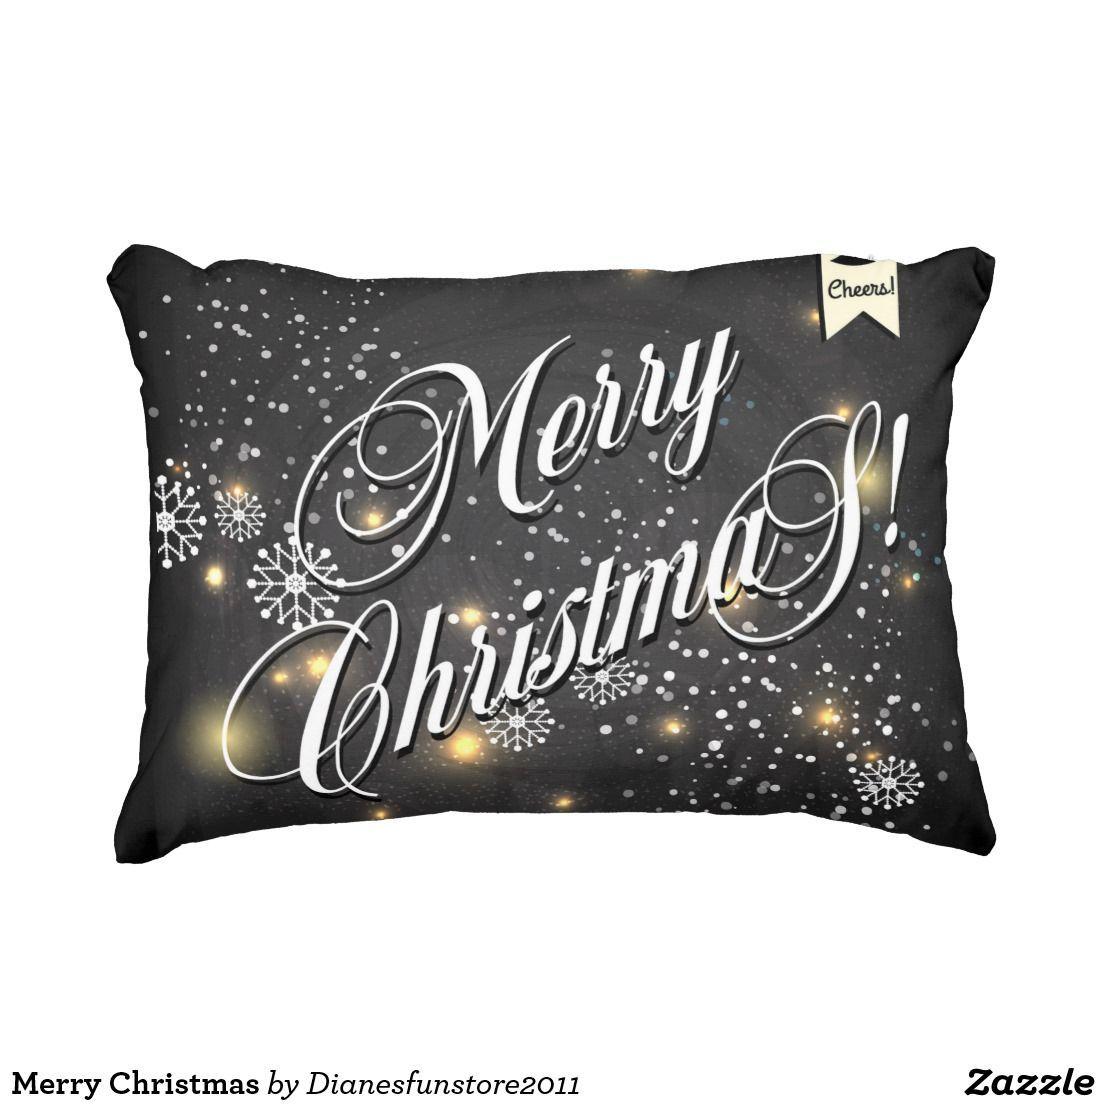 Top useful tips cheap decorative pillows duvet covers decorative